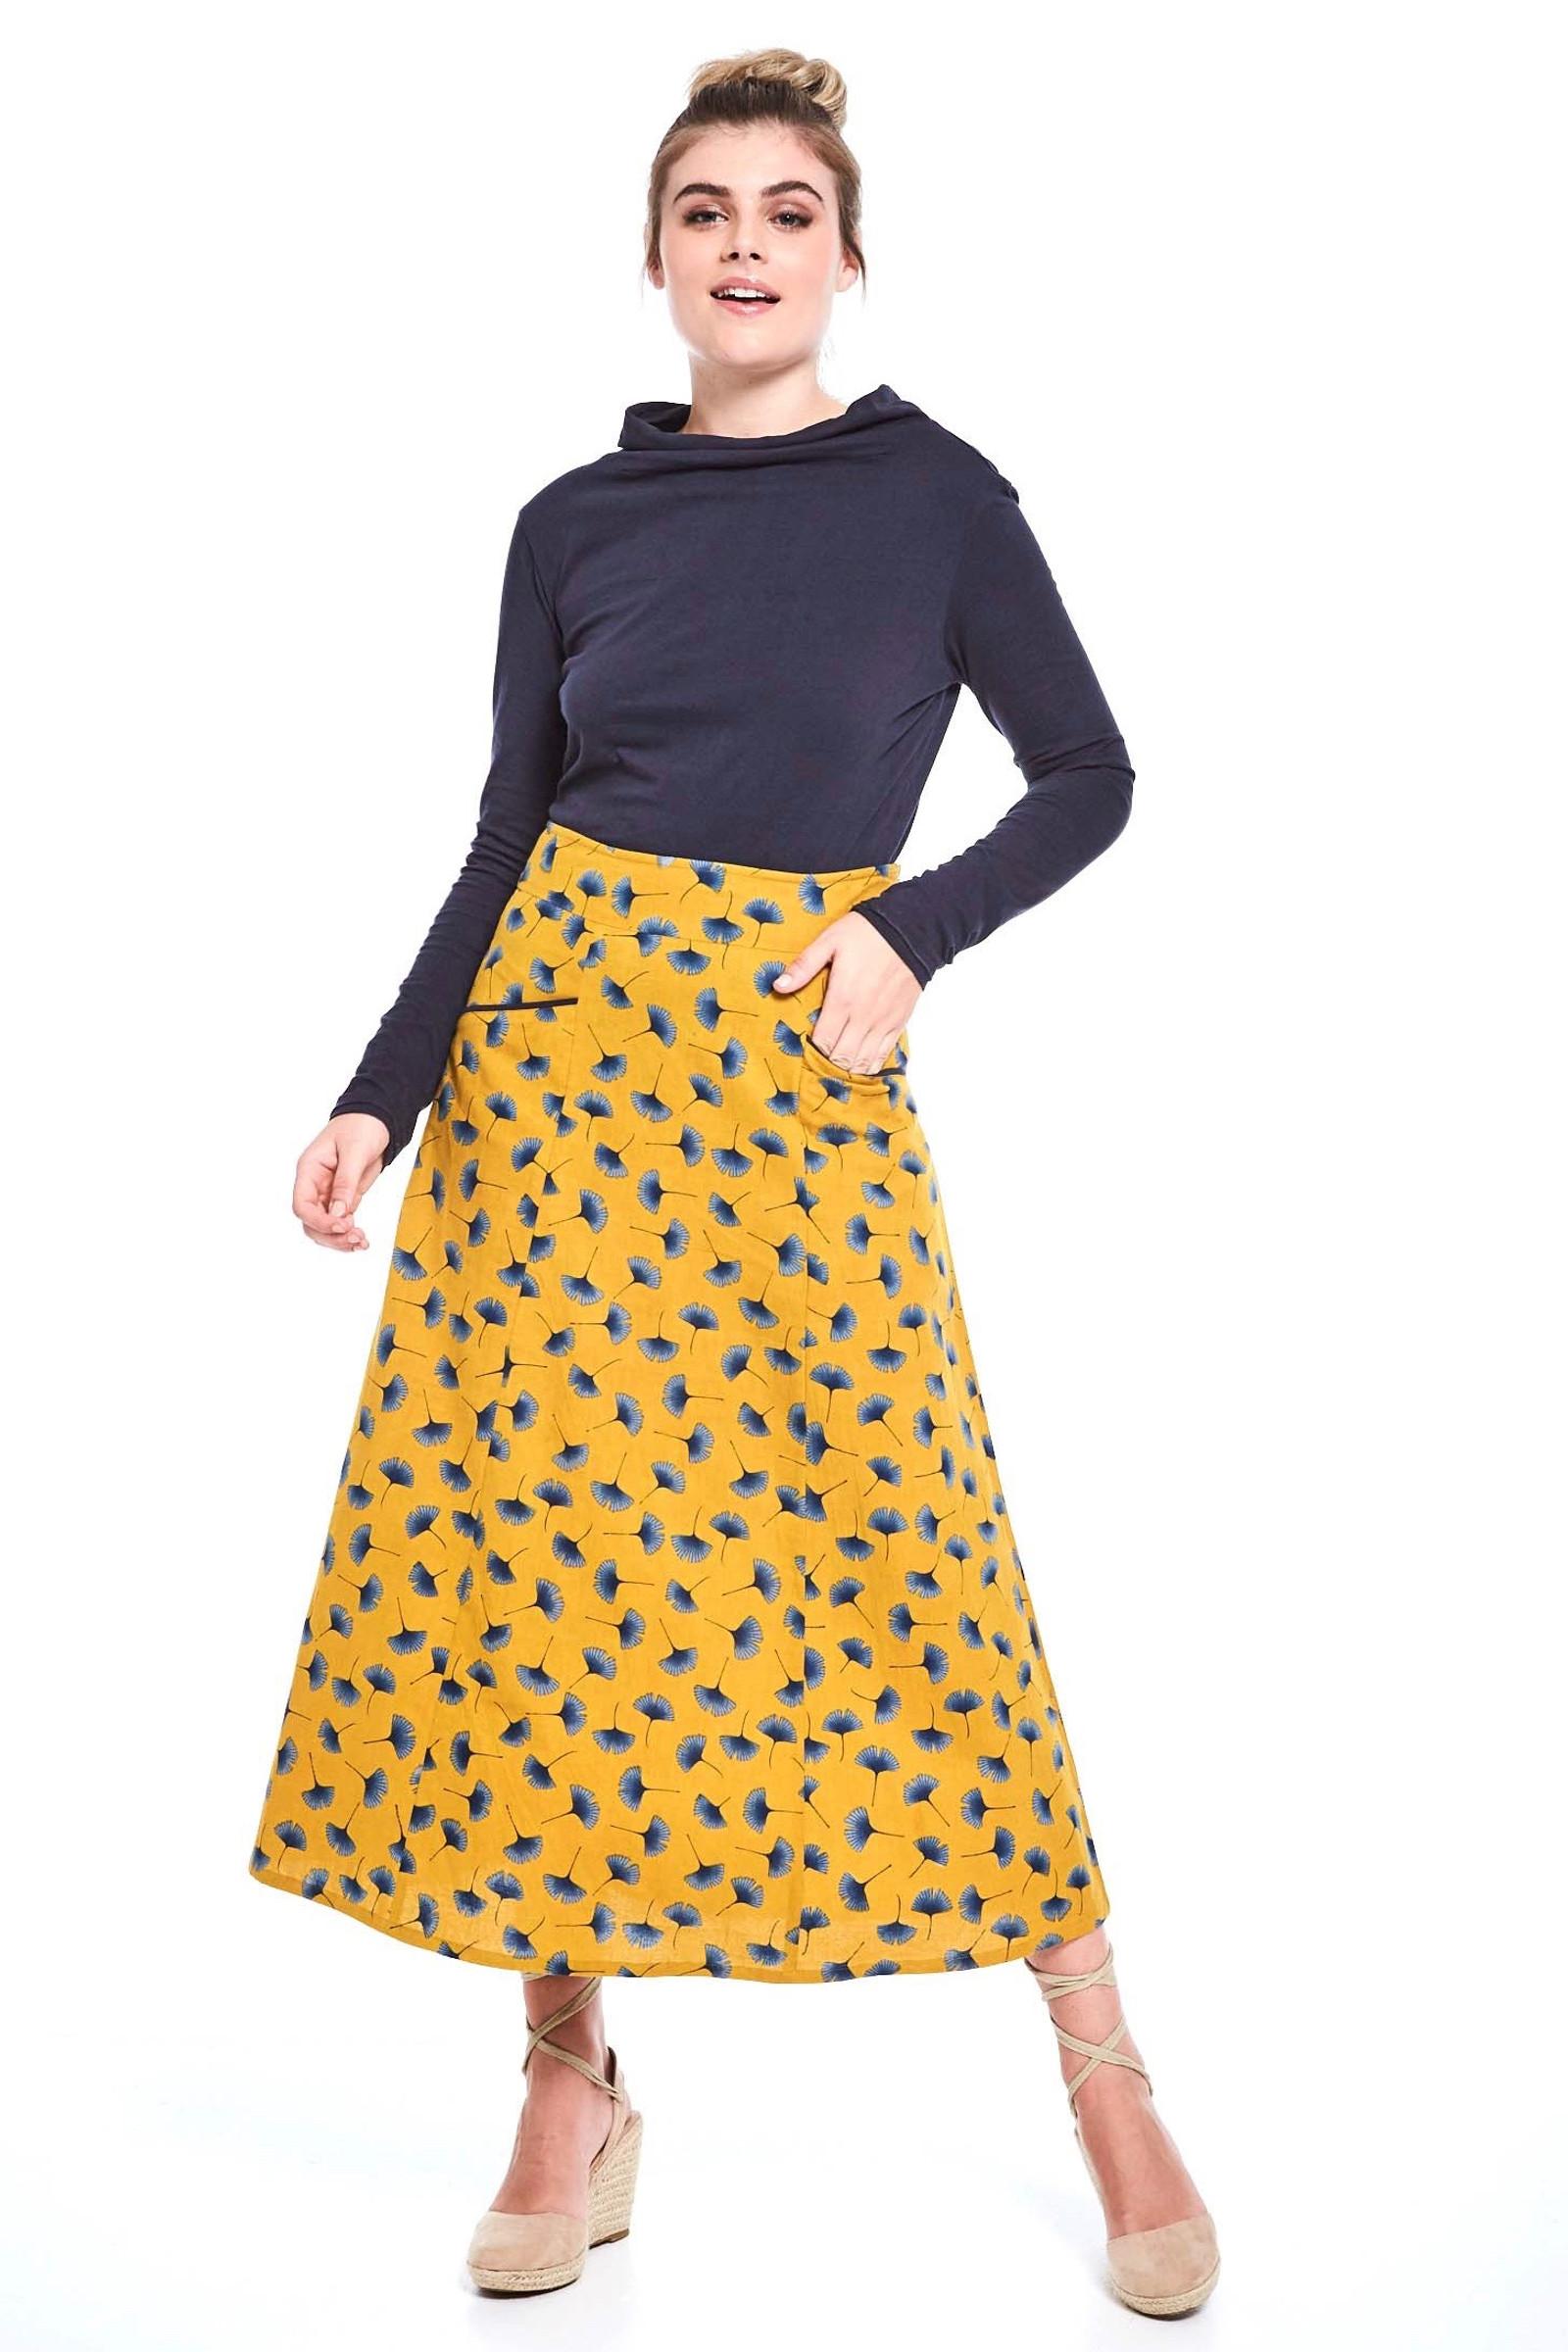 Susanna Skirt - Ginkgo Mustard